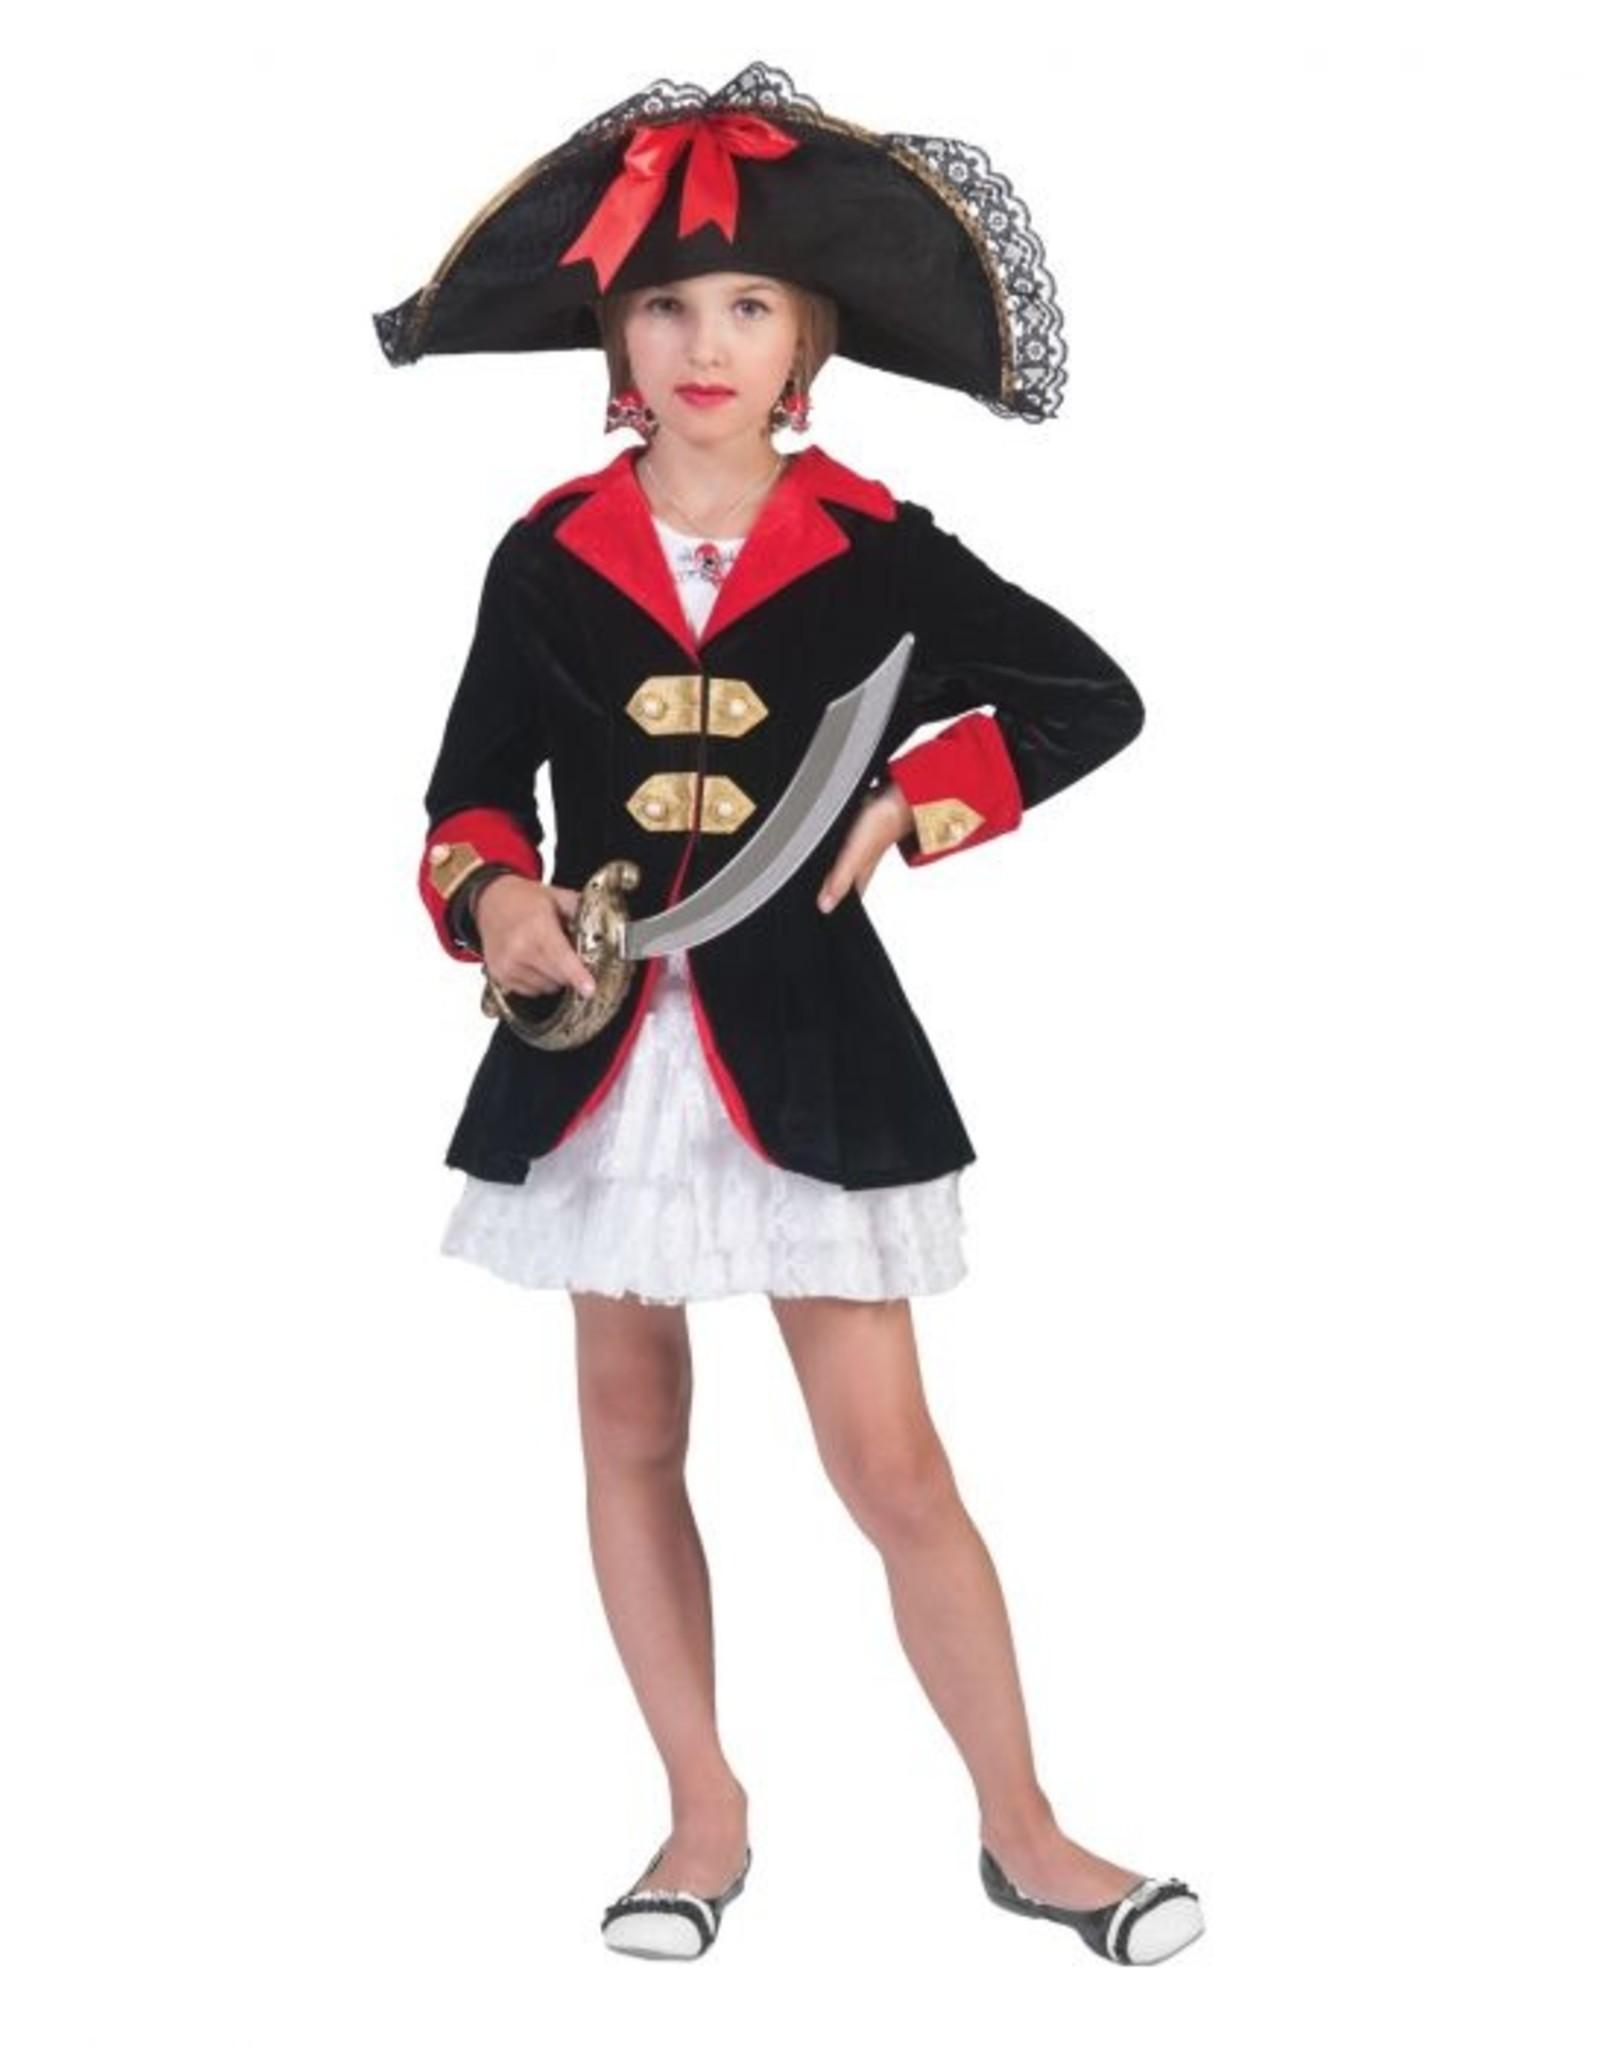 Funny Fashion Piraten jurk Florentine kind meisje